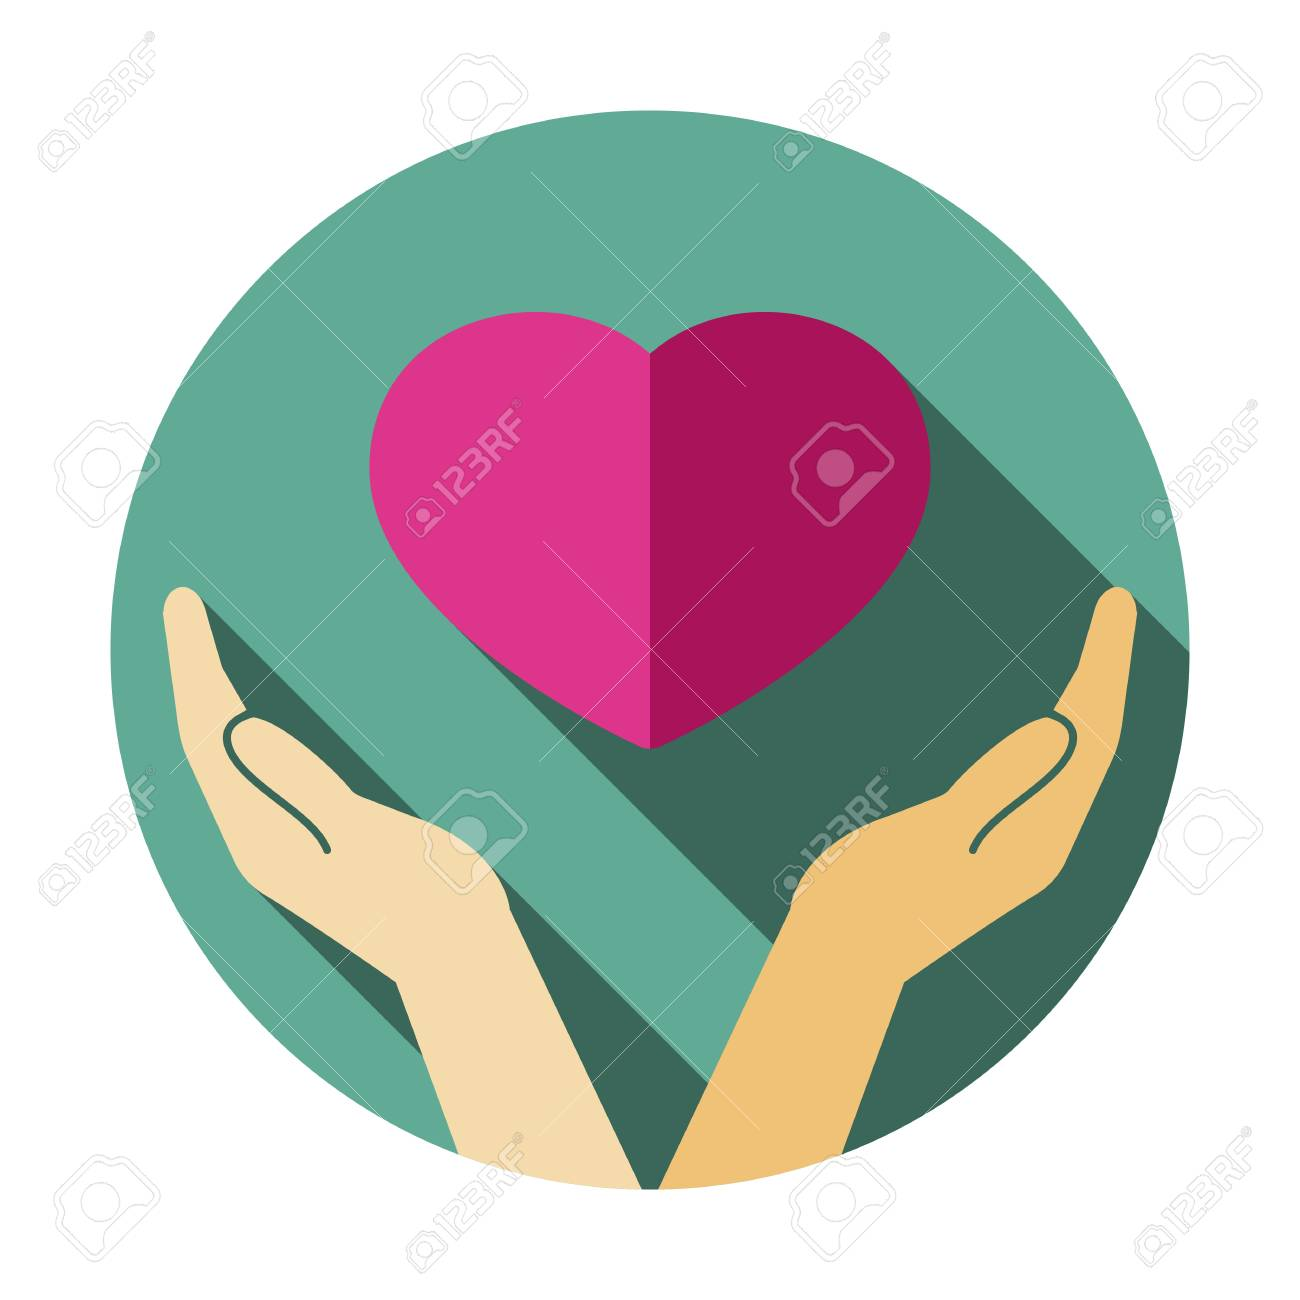 Hand, heart, love, romance icon, heart in hand symbol - 127520755